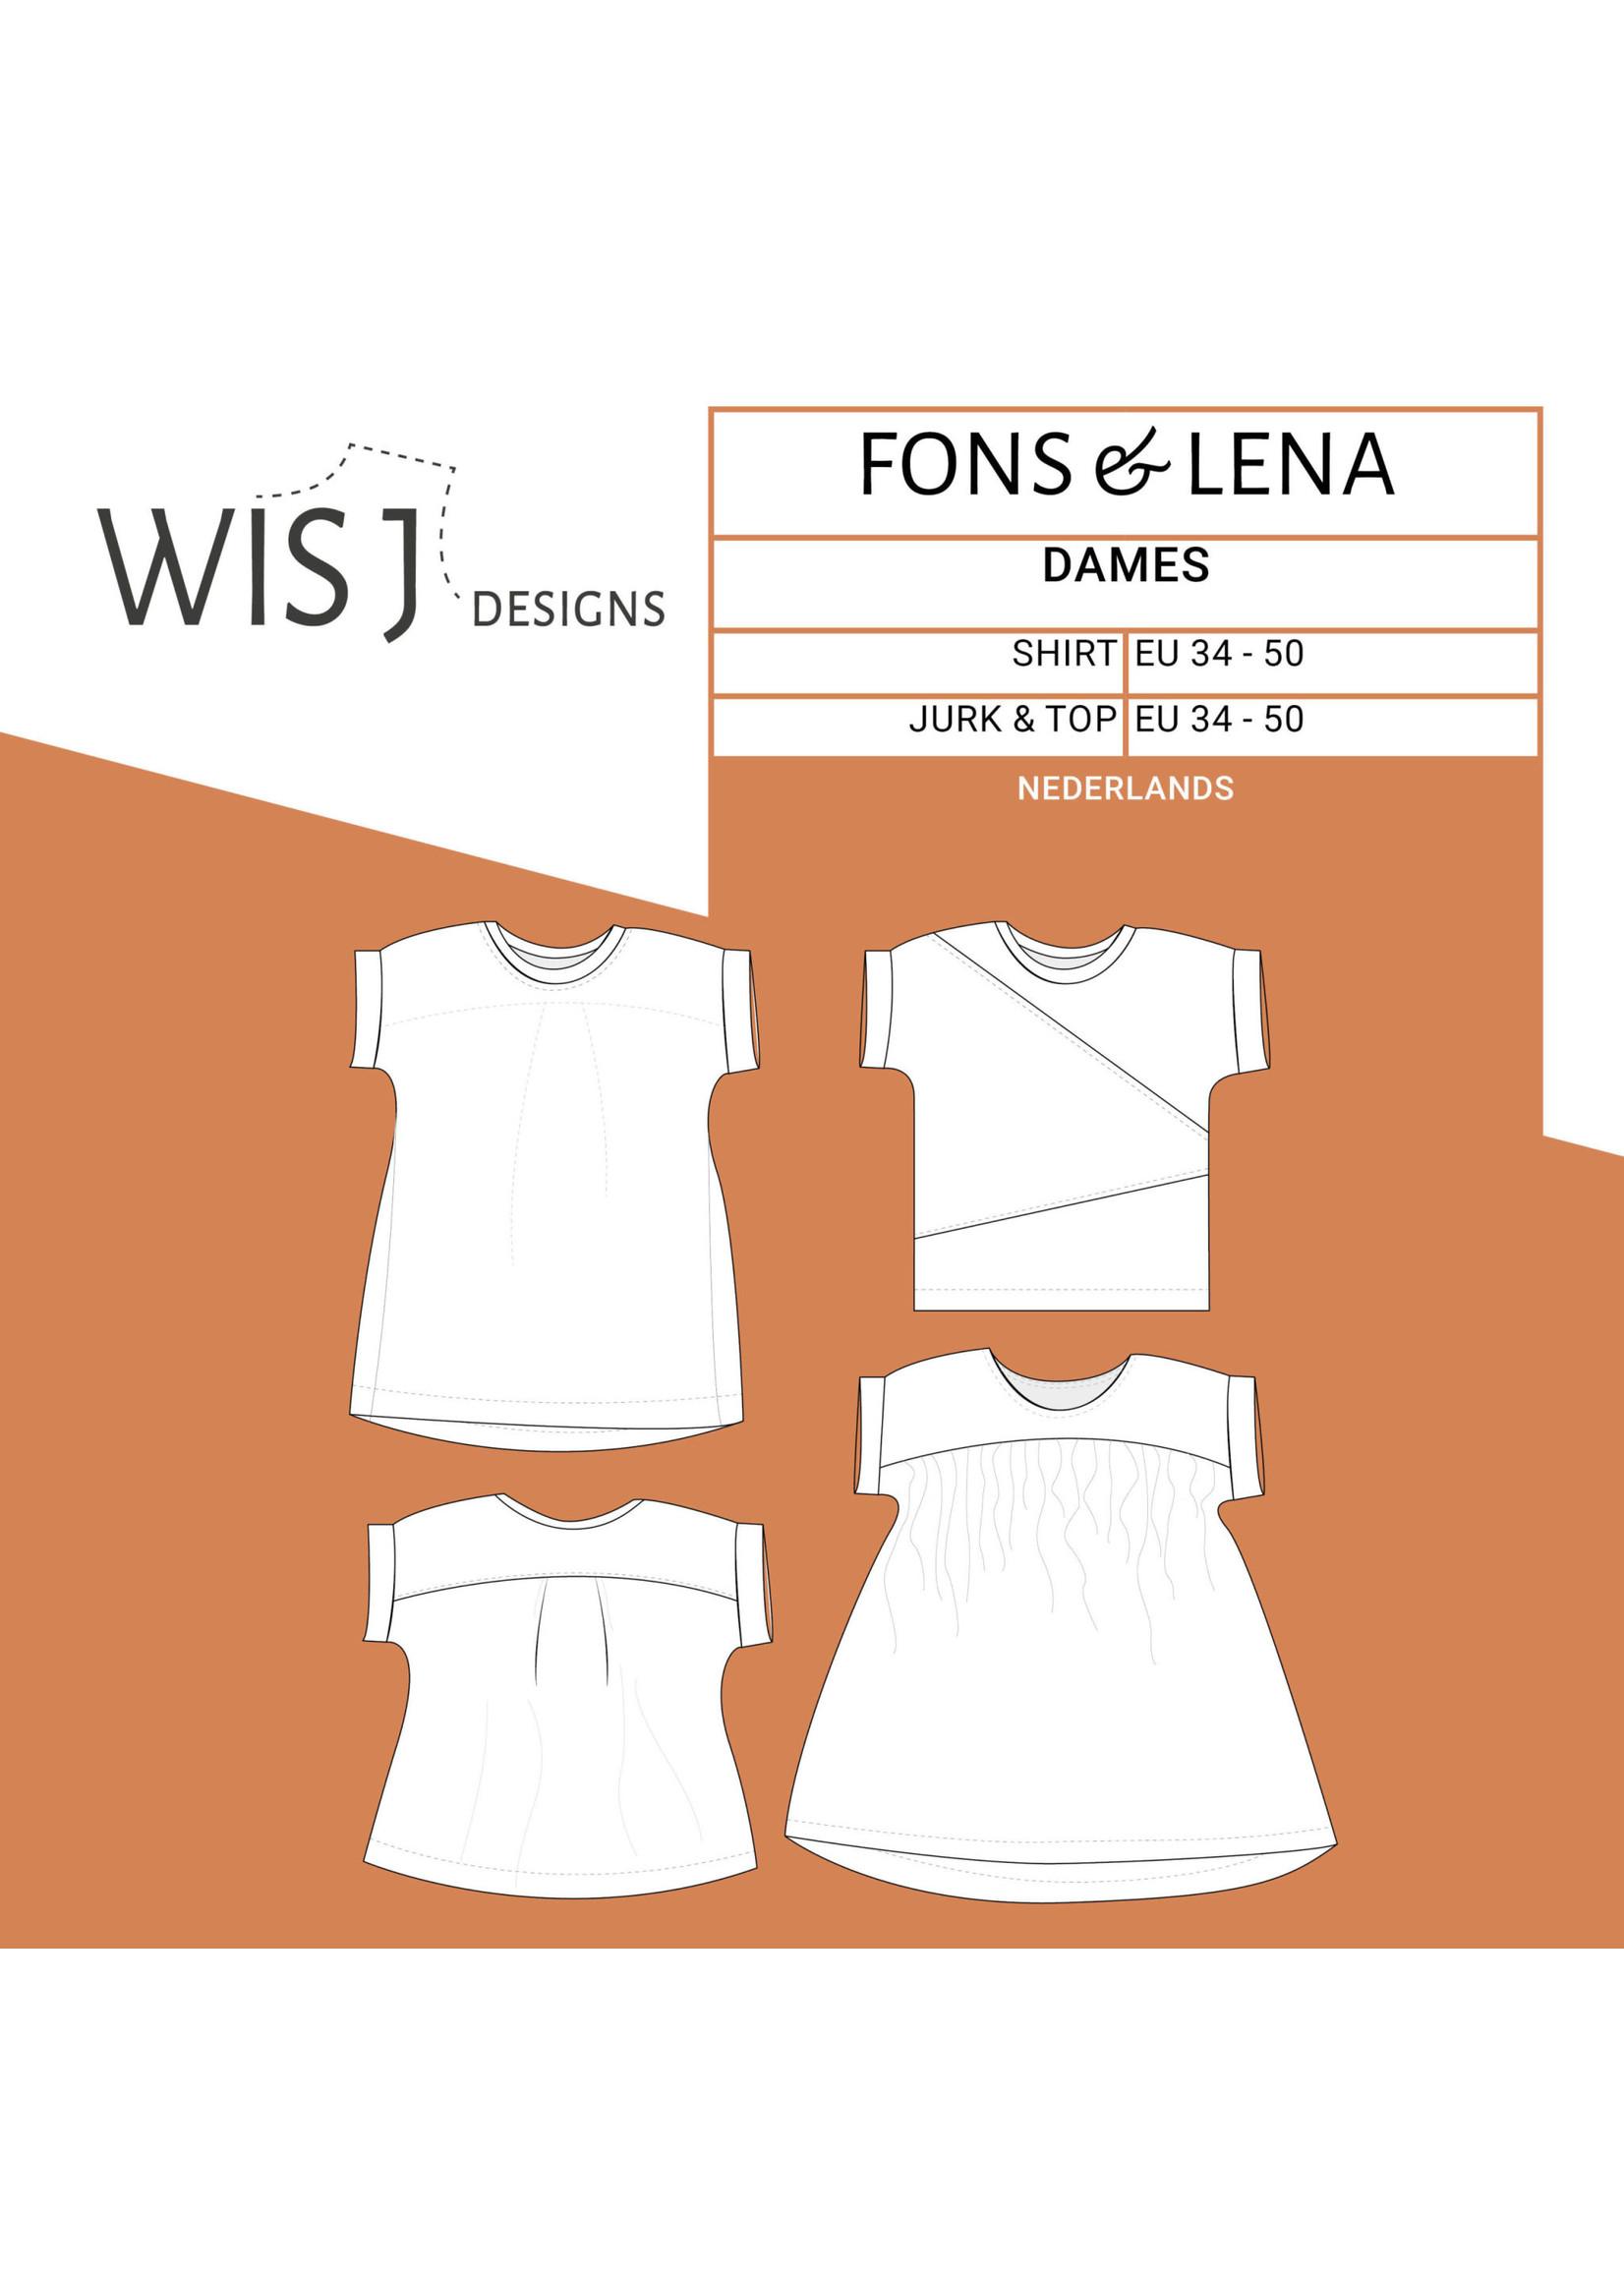 Wisj Designs Fons & lena dames